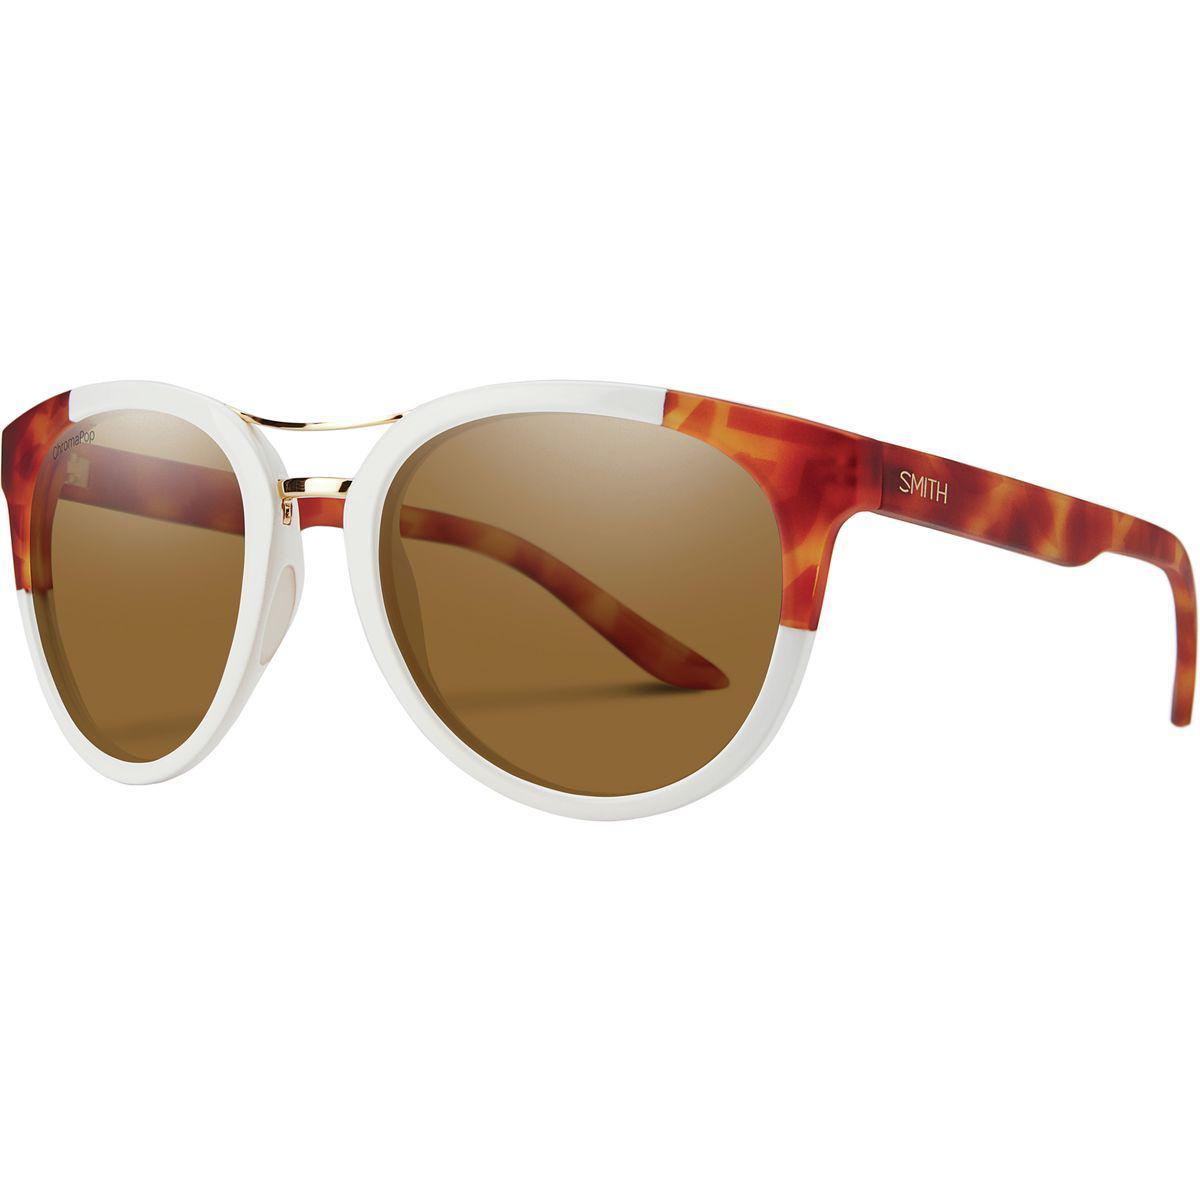 3e16a3b860a Lyst - Smith Bridgetown Chromapop Polarized Sunglasses in Brown